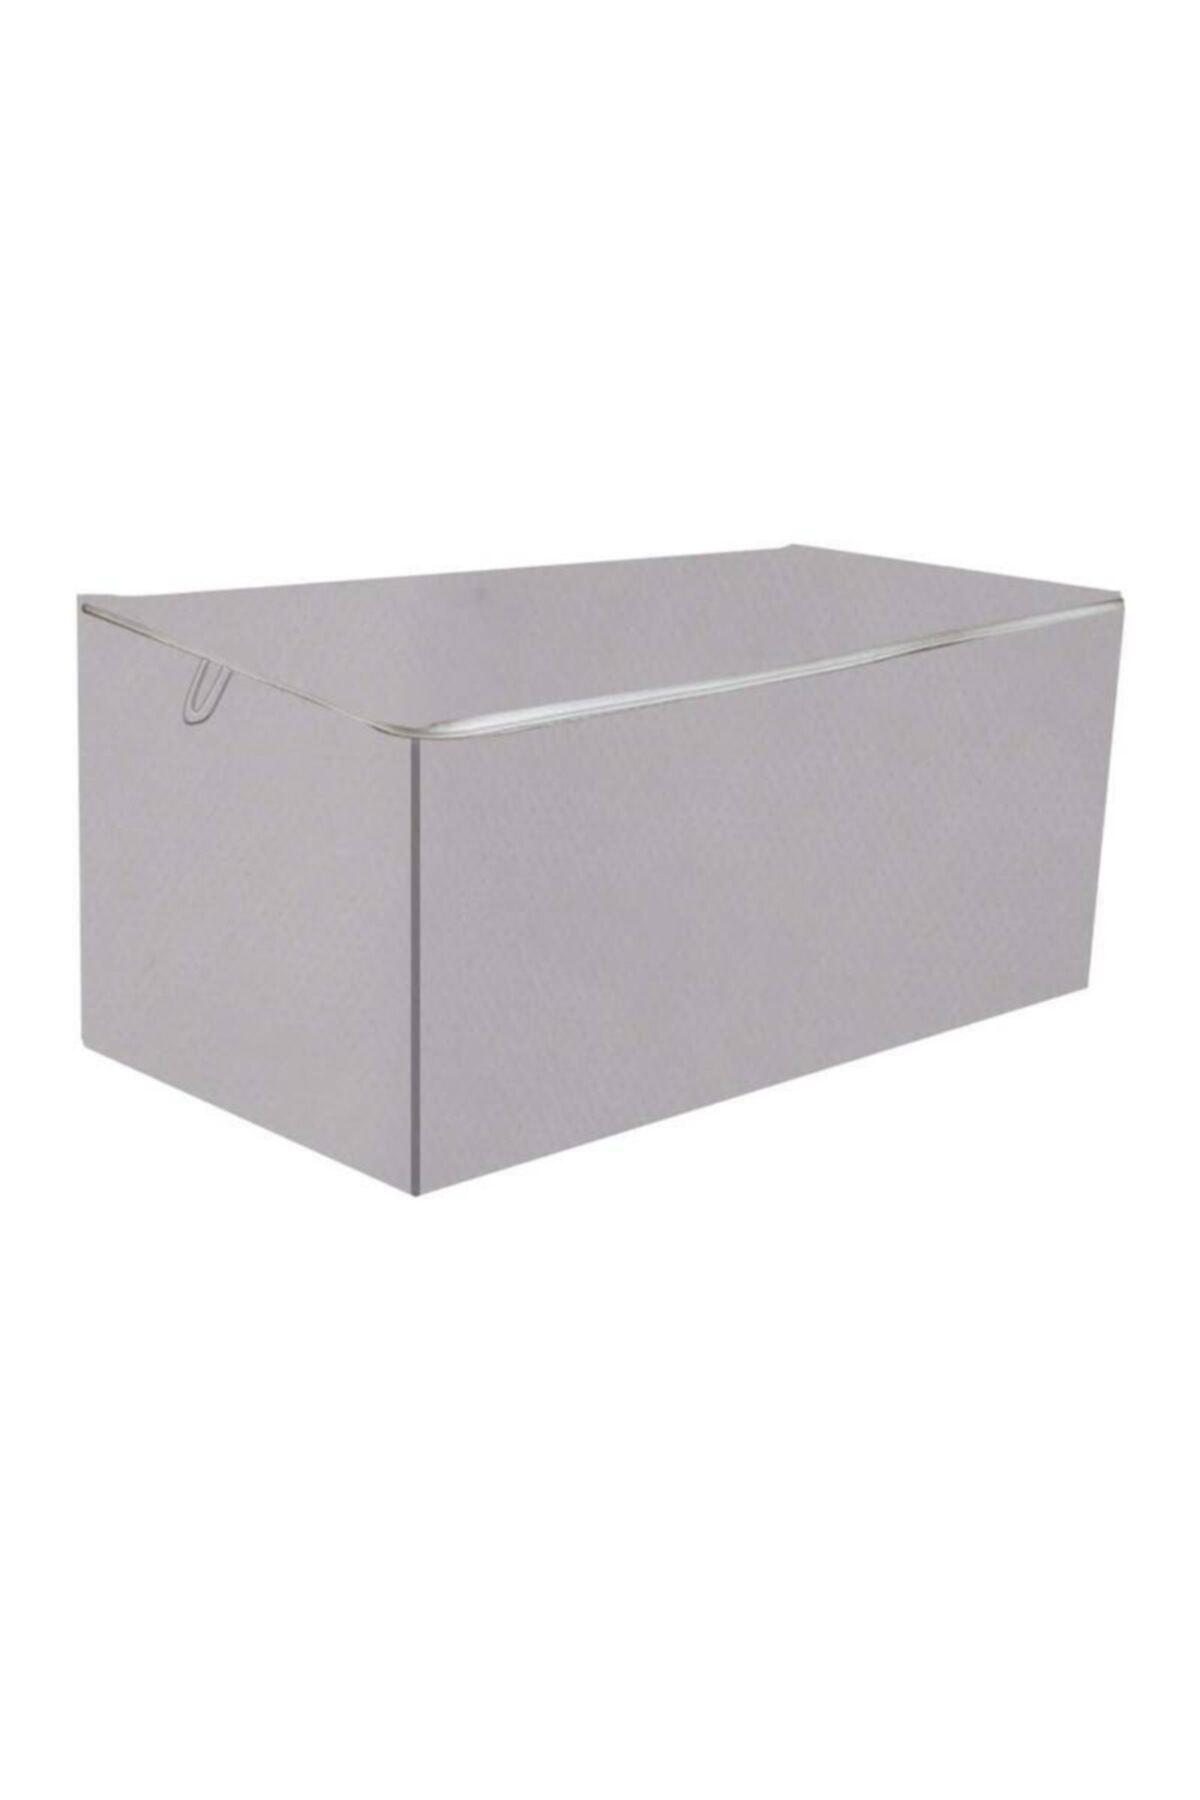 Simisso Kazak Hurcu 63x37x20 | Beyaz 1